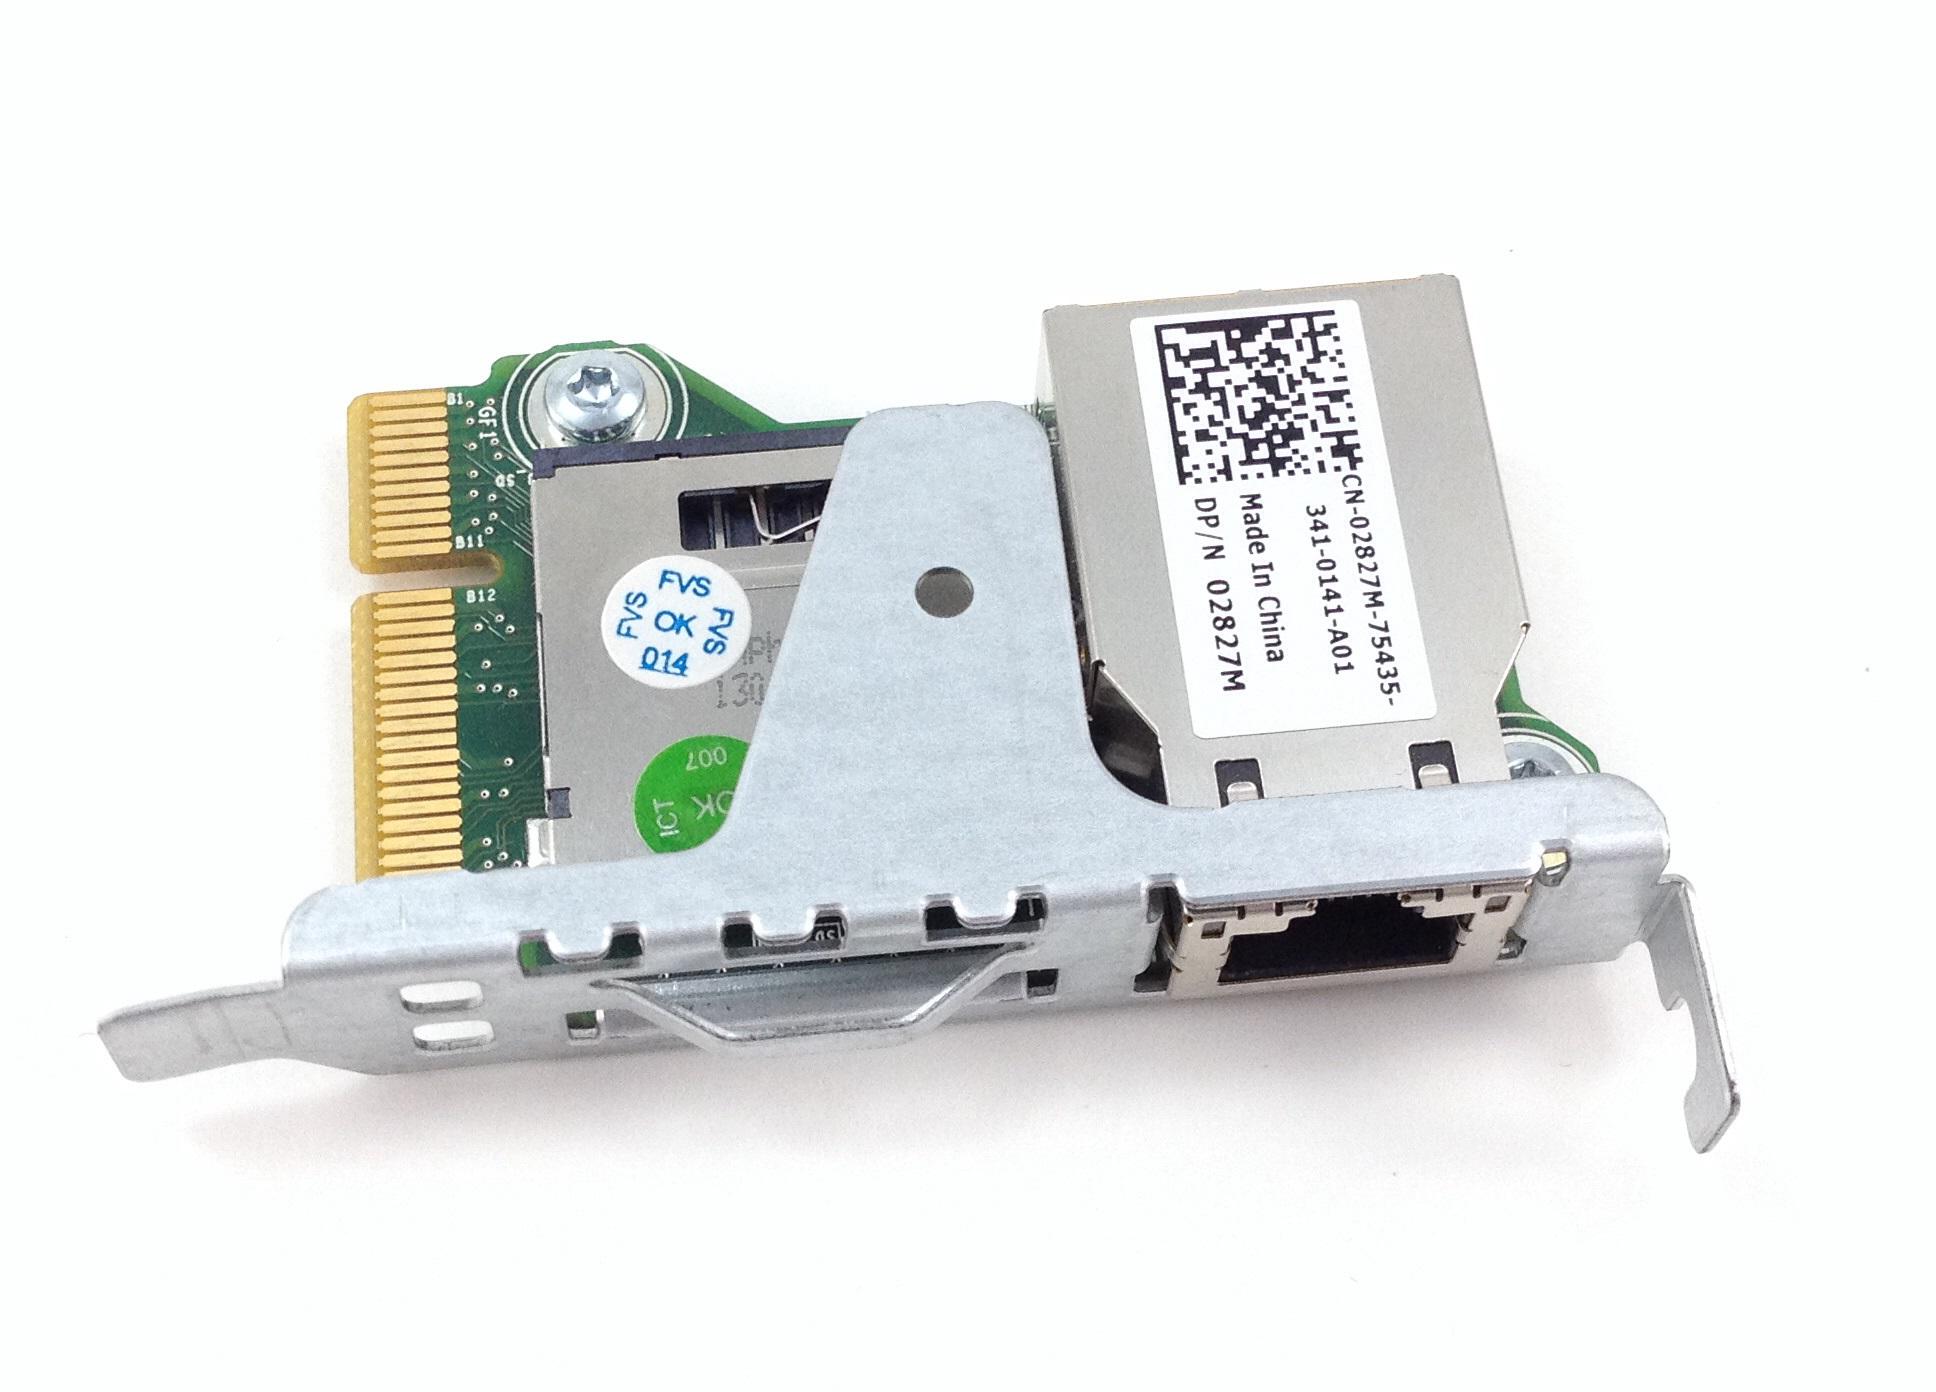 DELL IDRAC7 EXPRESS REMOTE ACCESS CARD FOR R320 R420 R520 R620 T320 T420  (02827M)